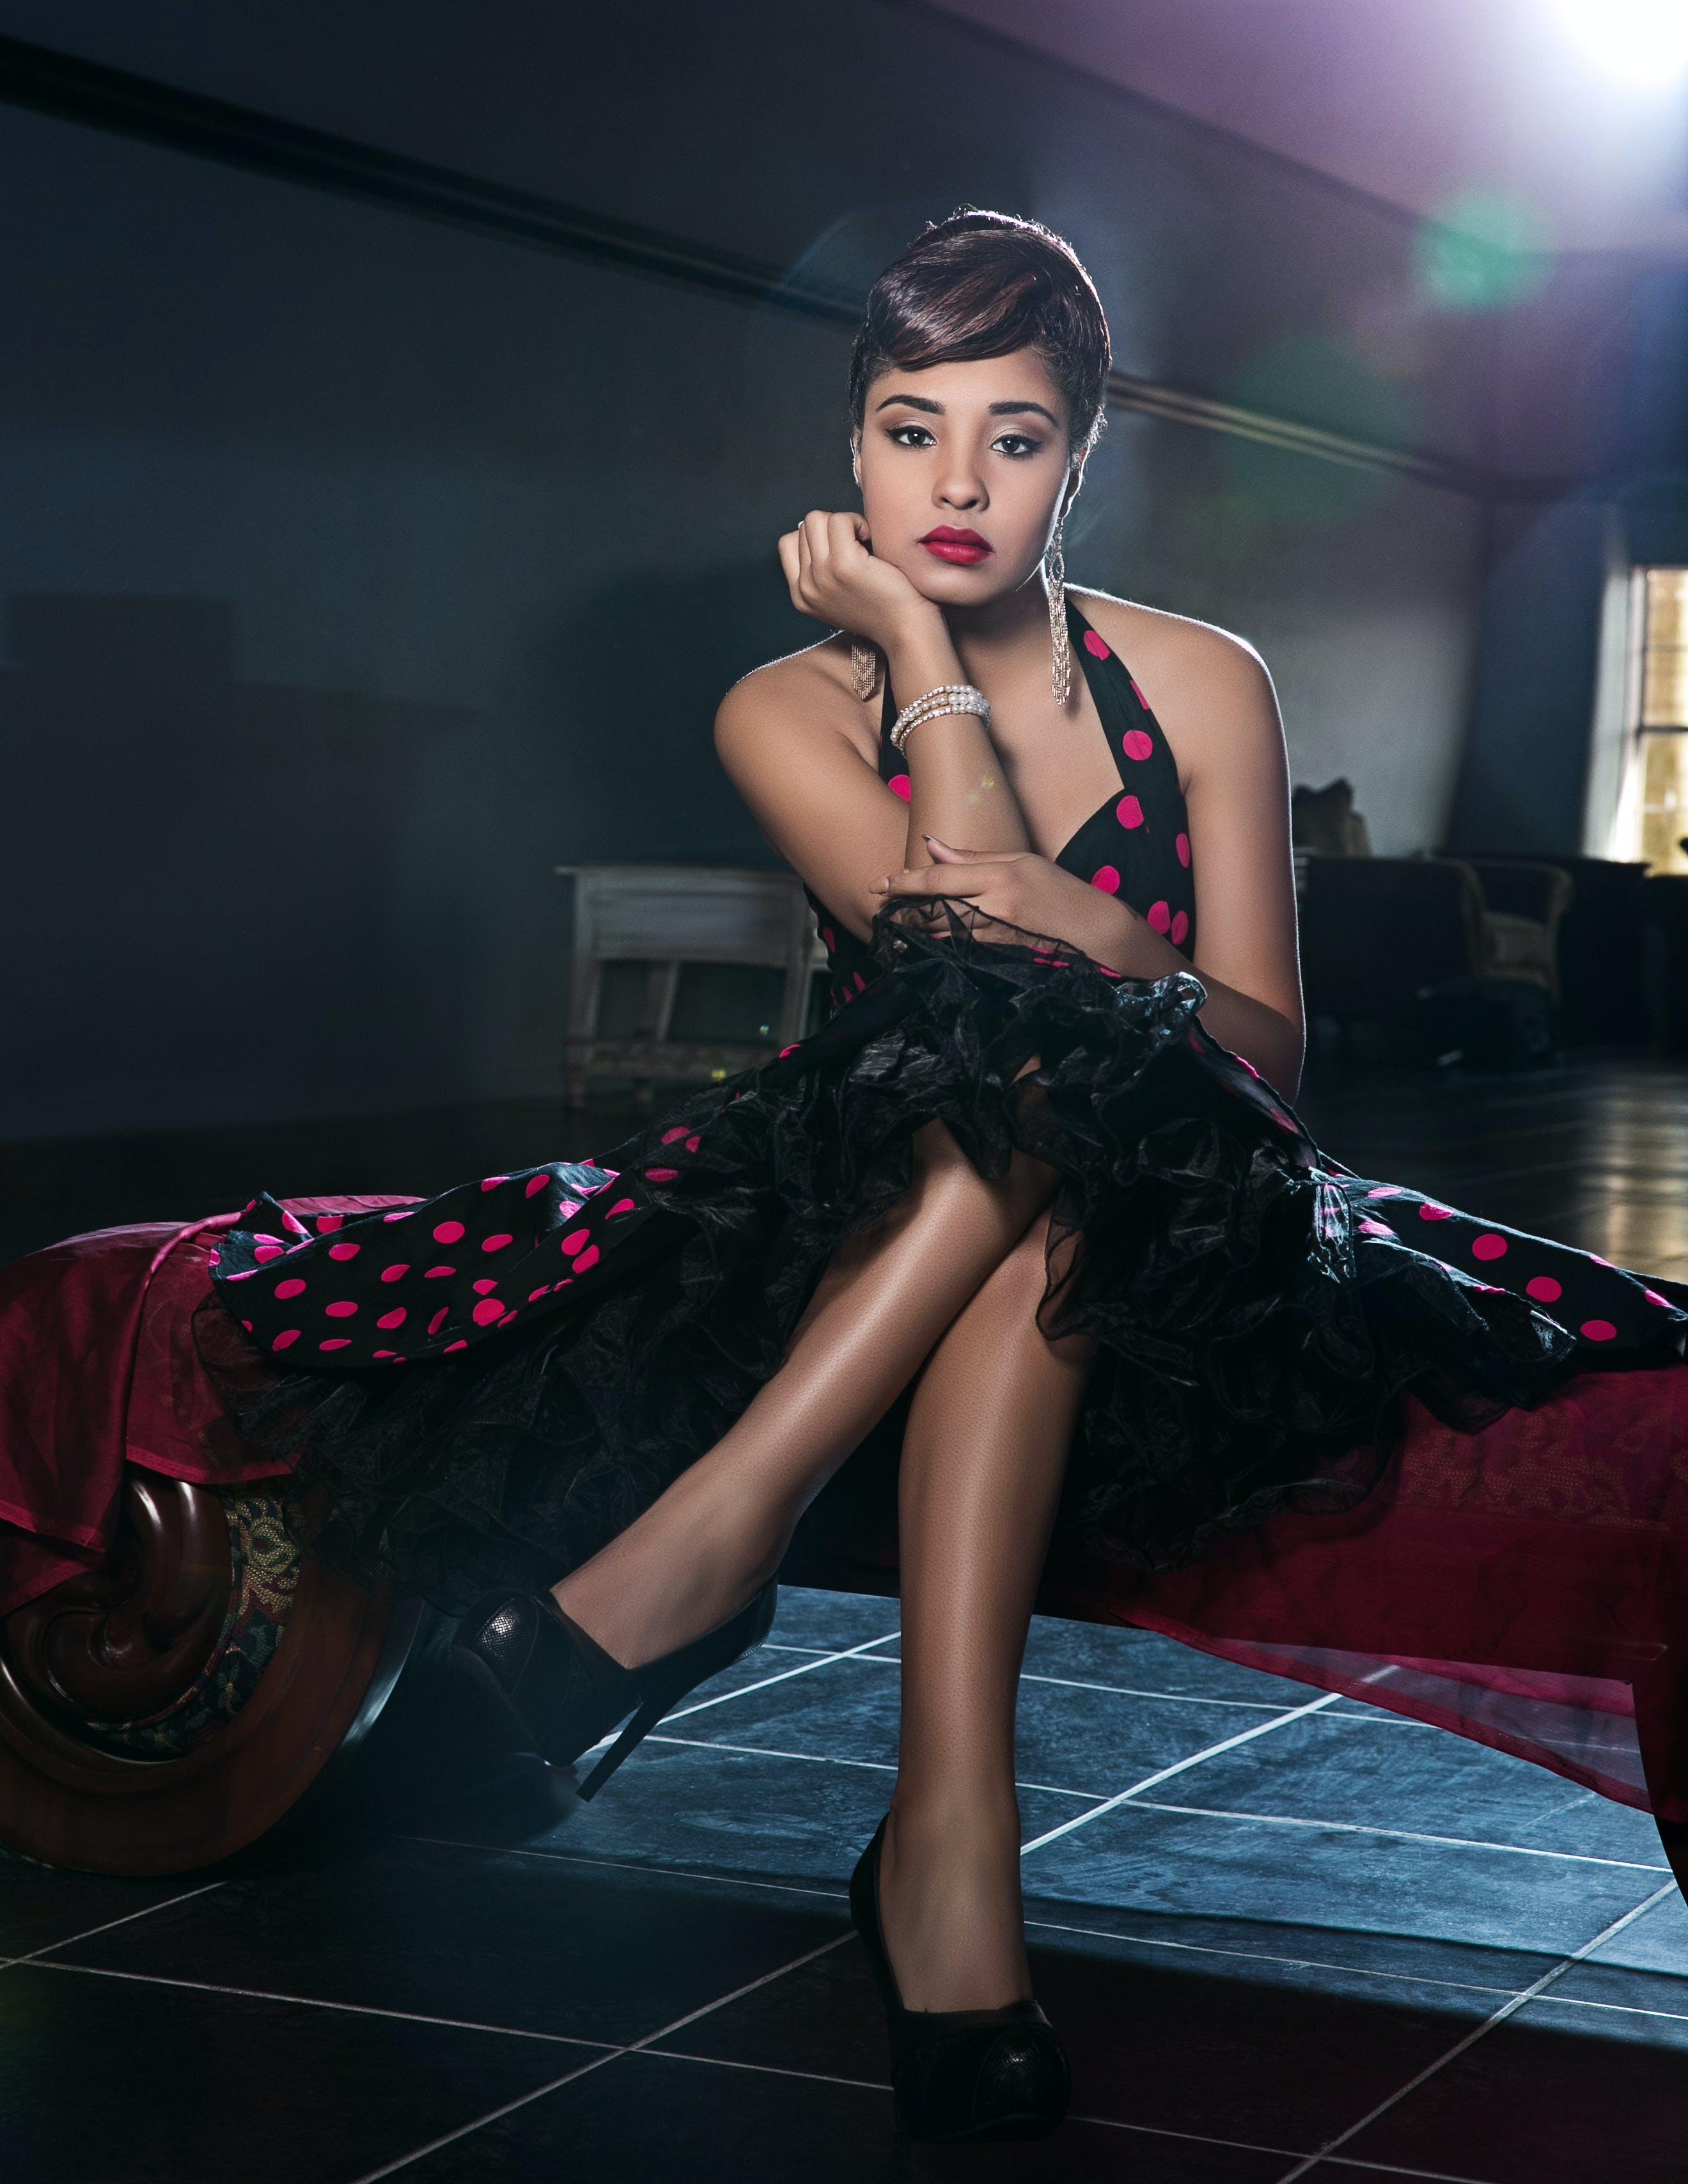 Sitting Woman Wearing Black and Red Polka-dot Halter Dress Inside Dim-lit Room